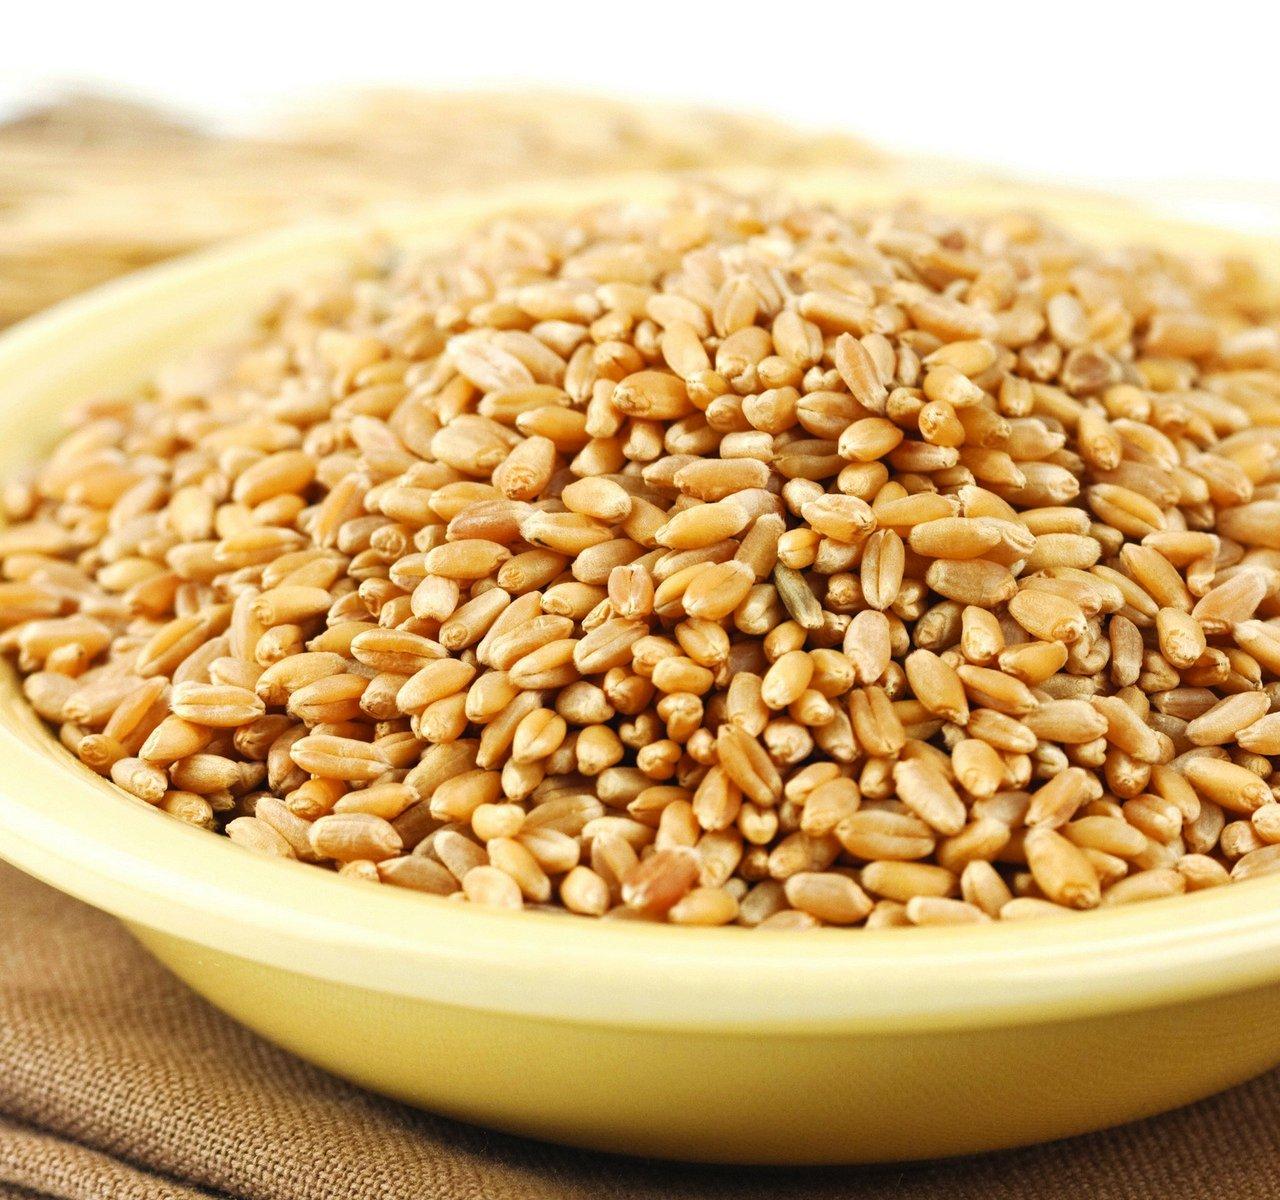 Wheat Montana Prairie Gold Hard White Spring Wheat Berries, 25 Lb. Bag